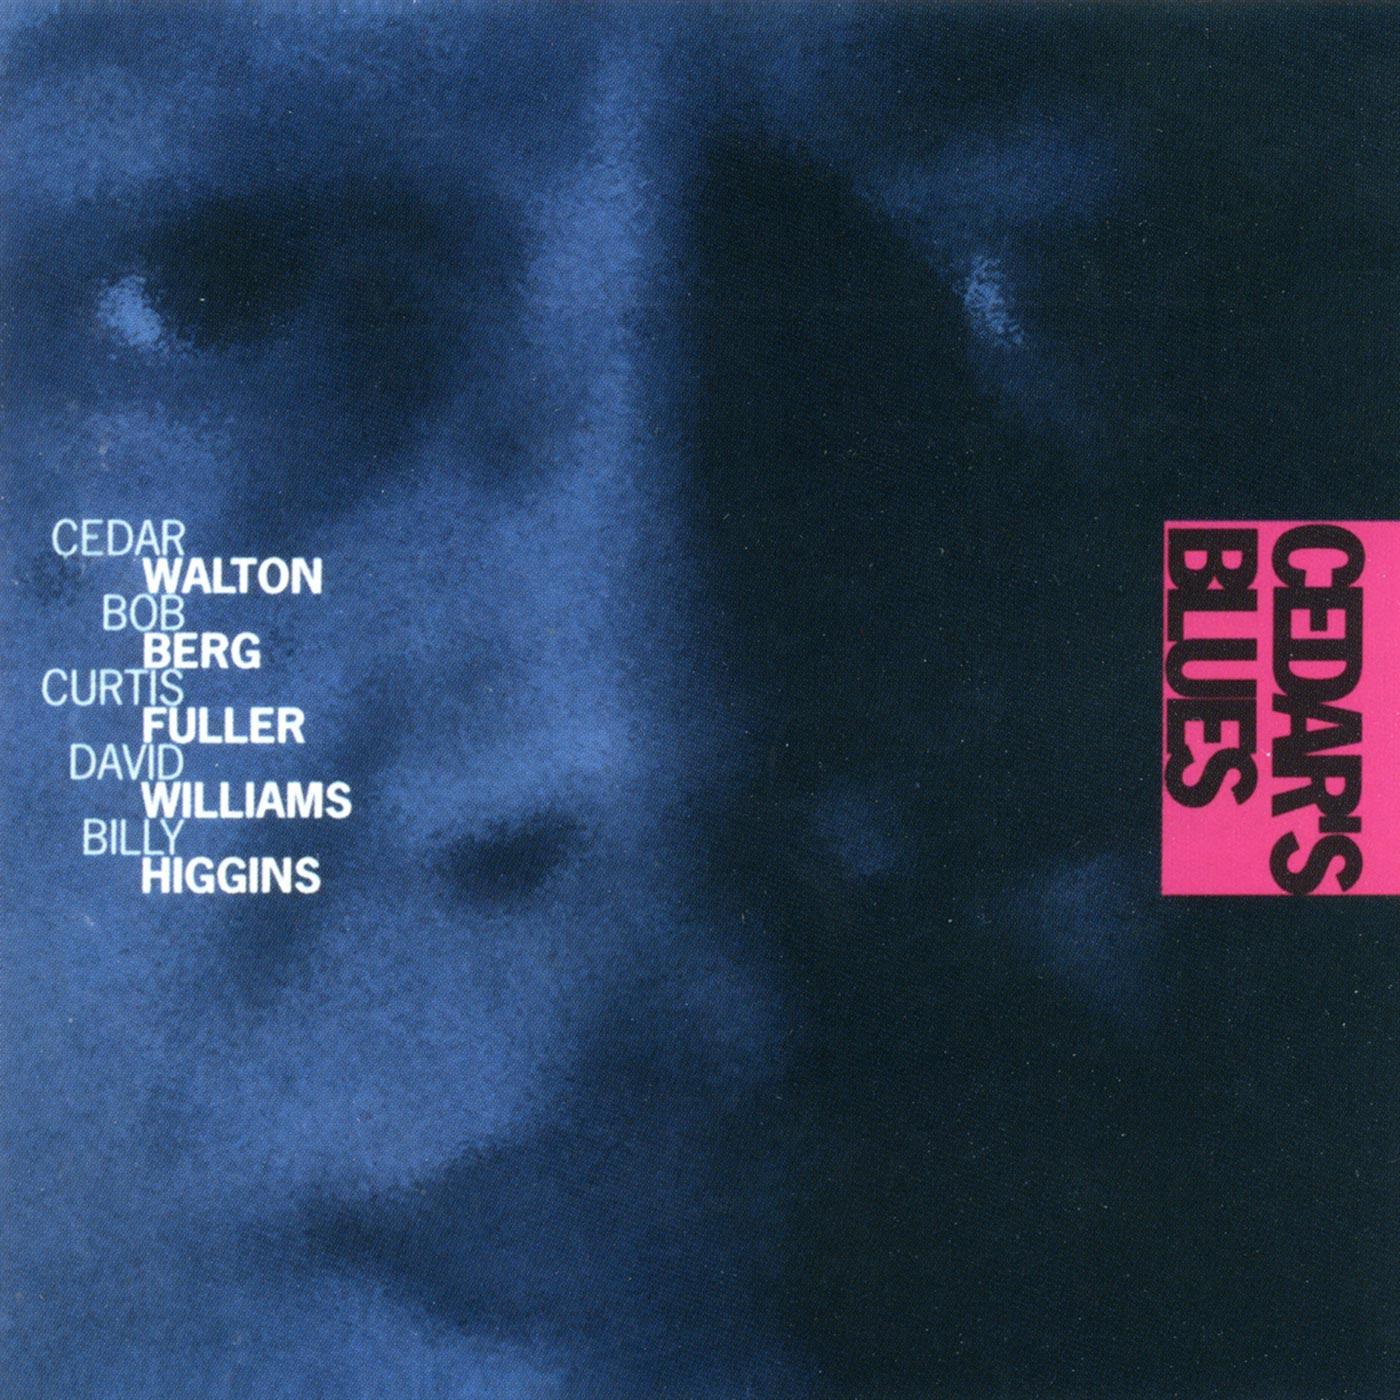 Cedar's Blues - Cedar Walton Quintet